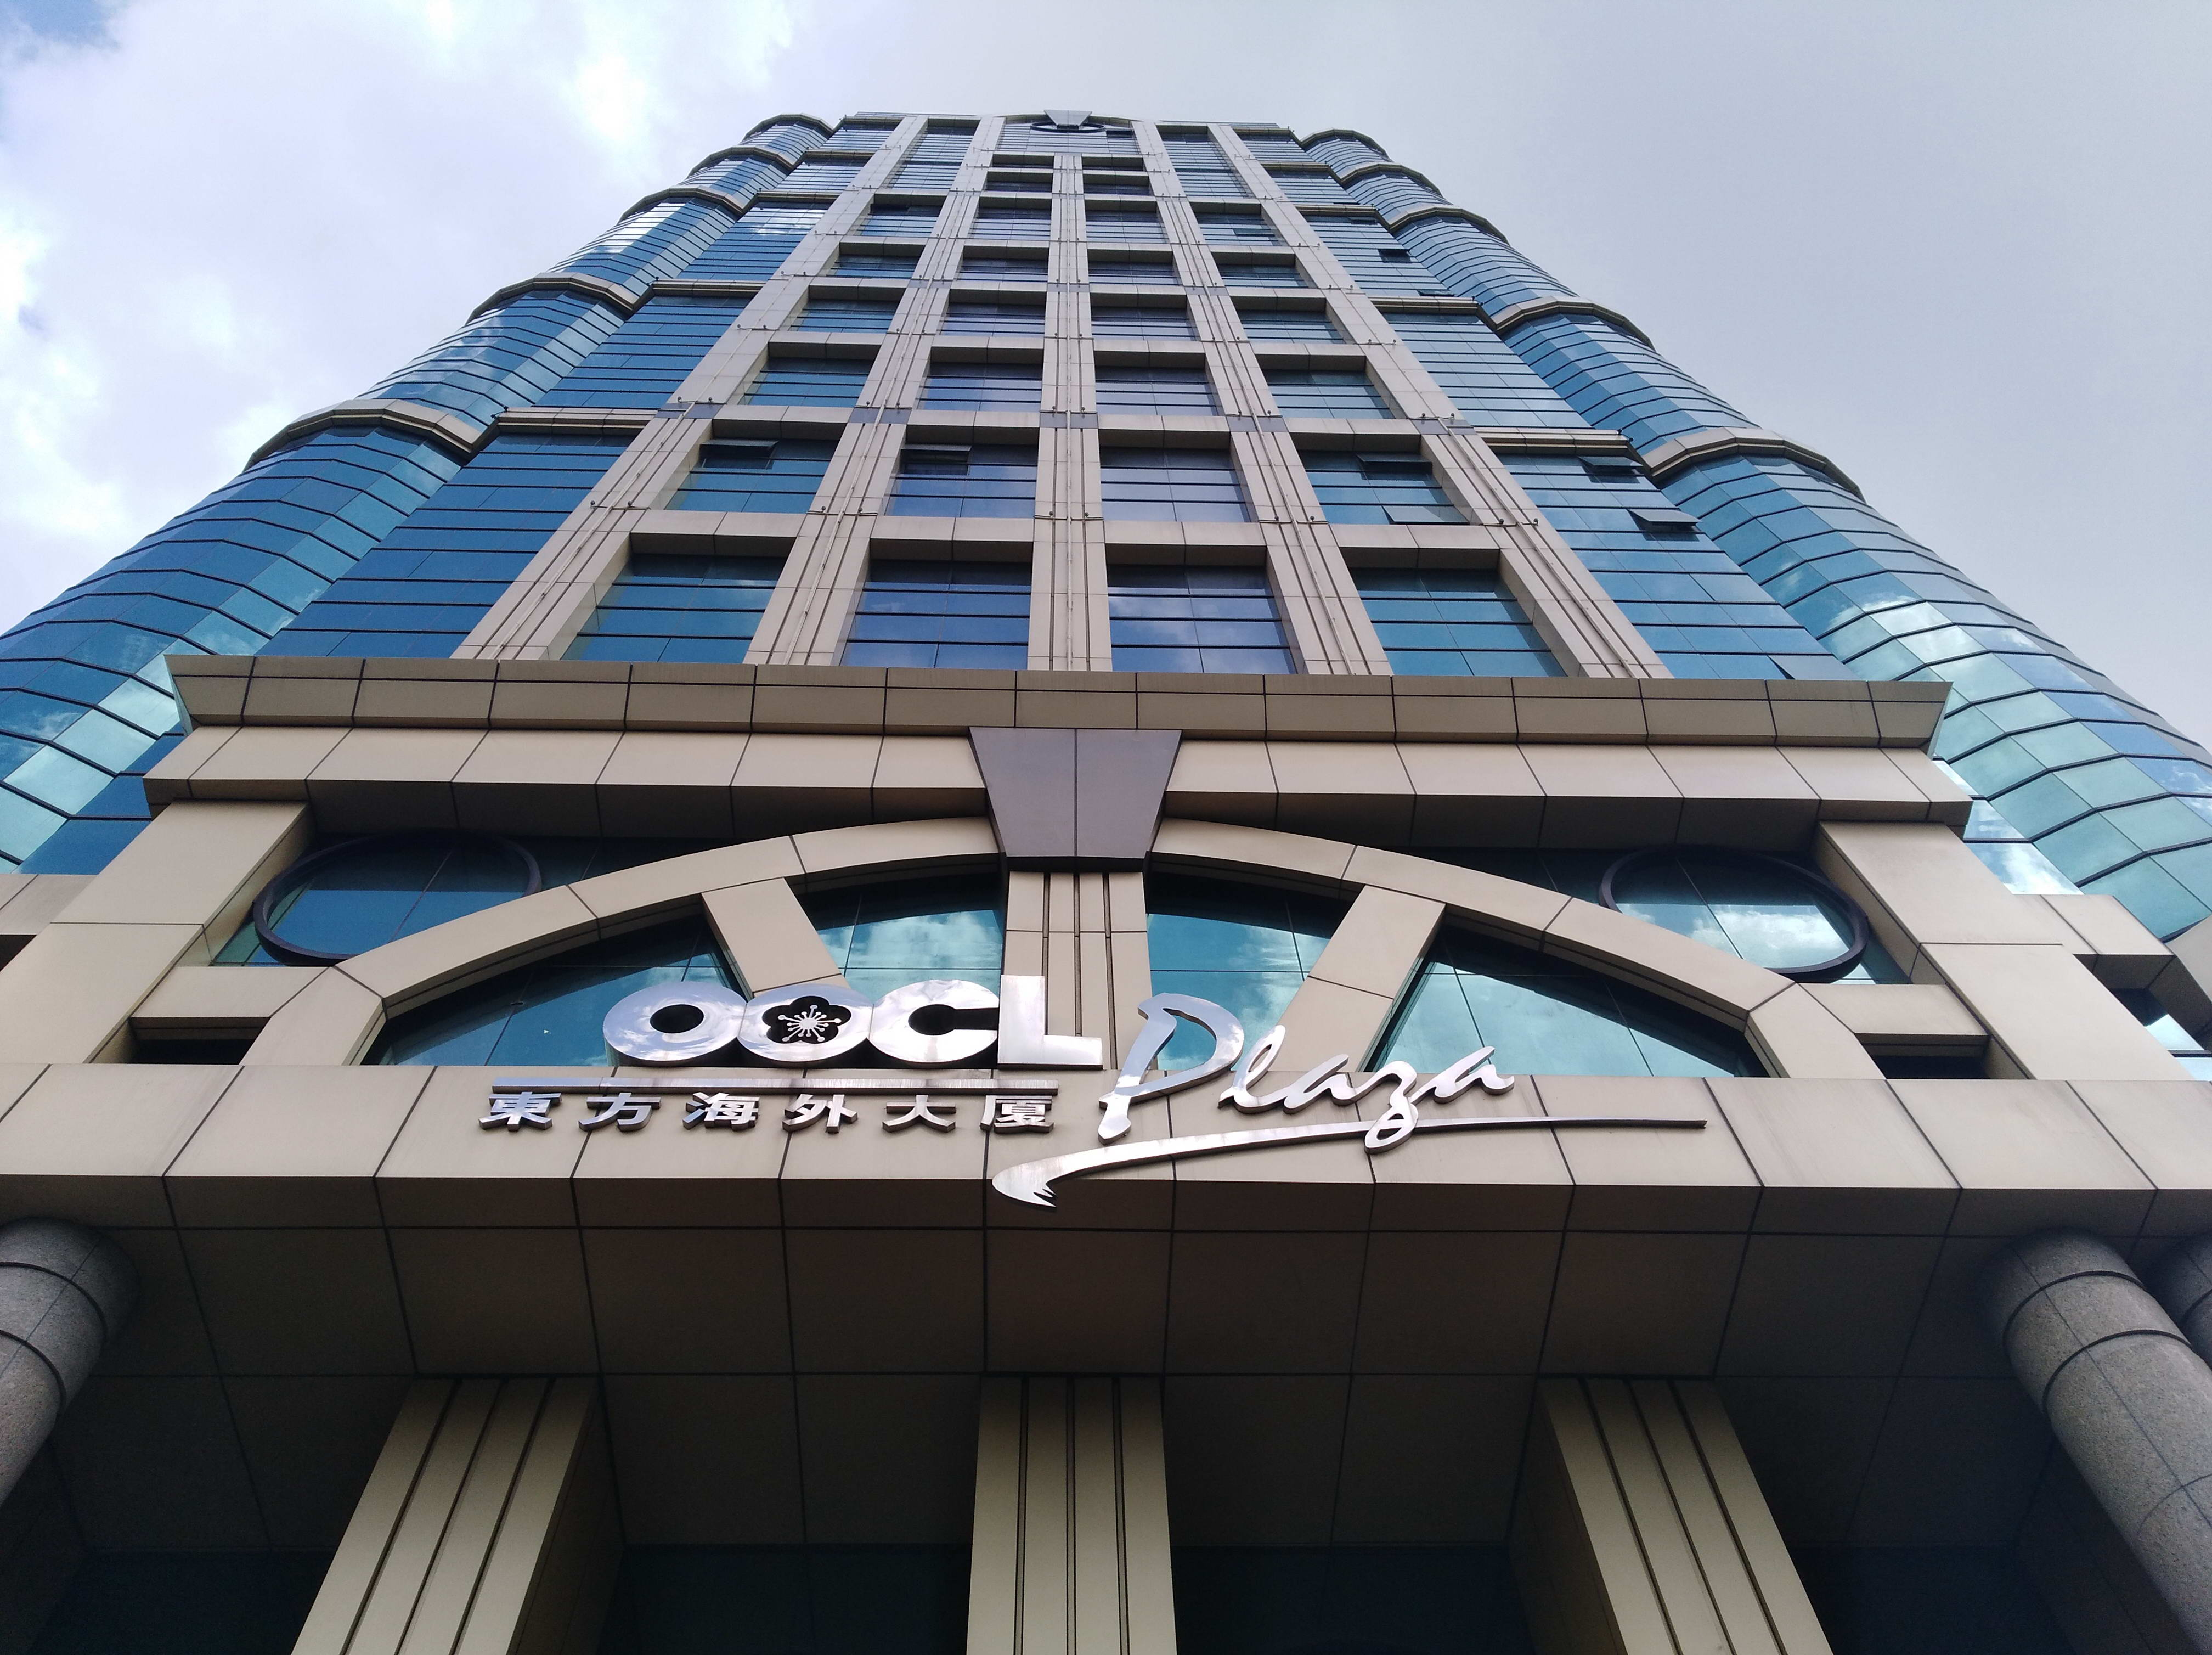 OOCL Plaza Expatrimo Shanghai